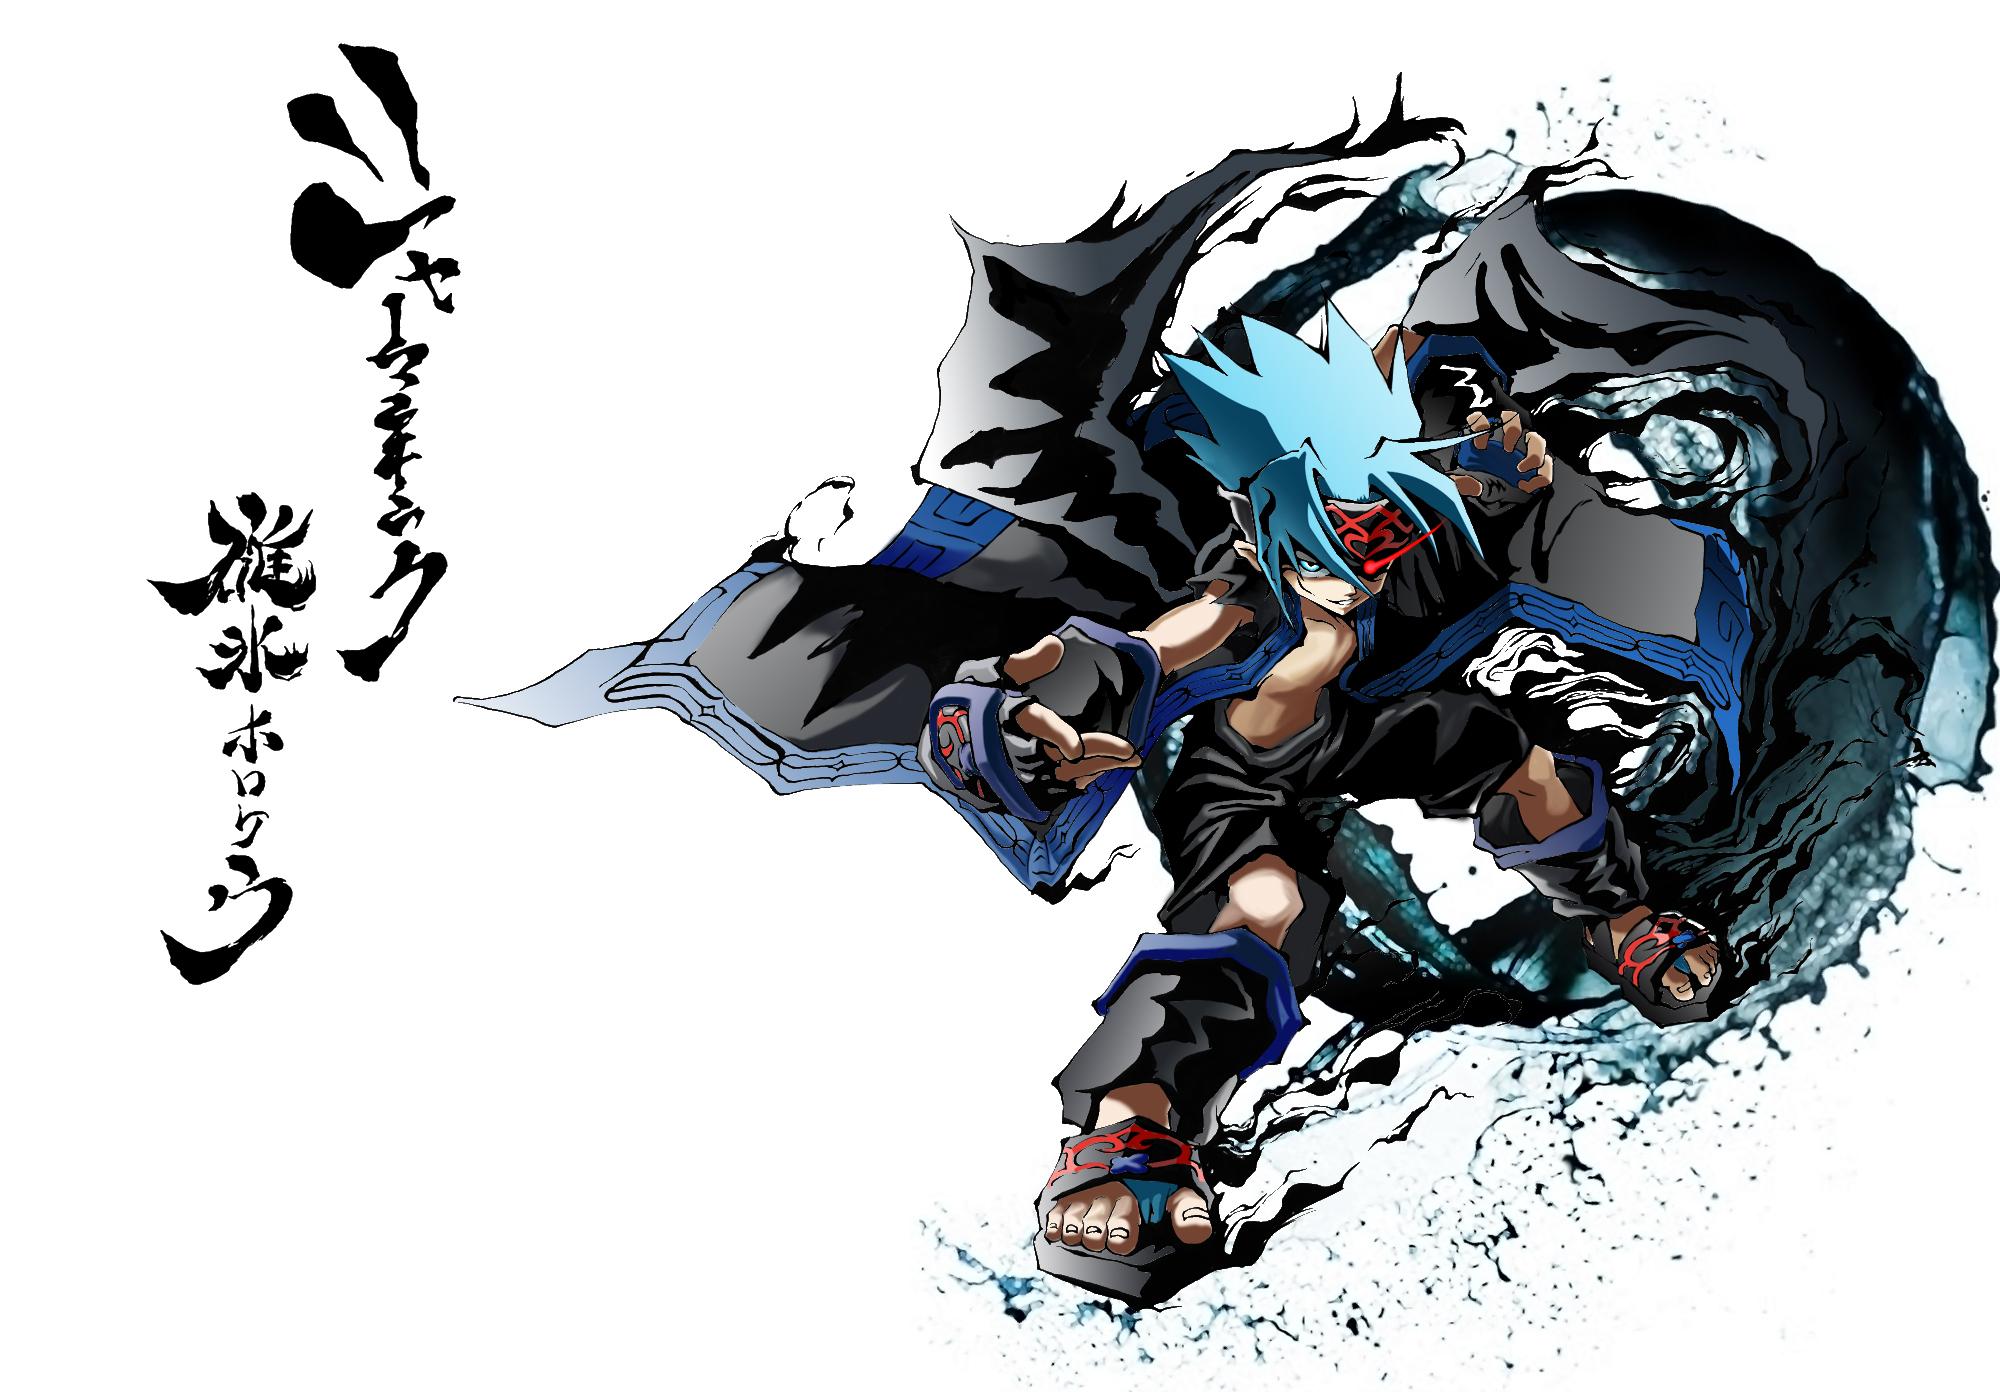 Shaman king hd wallpaper background image 2000x1392 - Wallpaper anime hd untuk pc ...